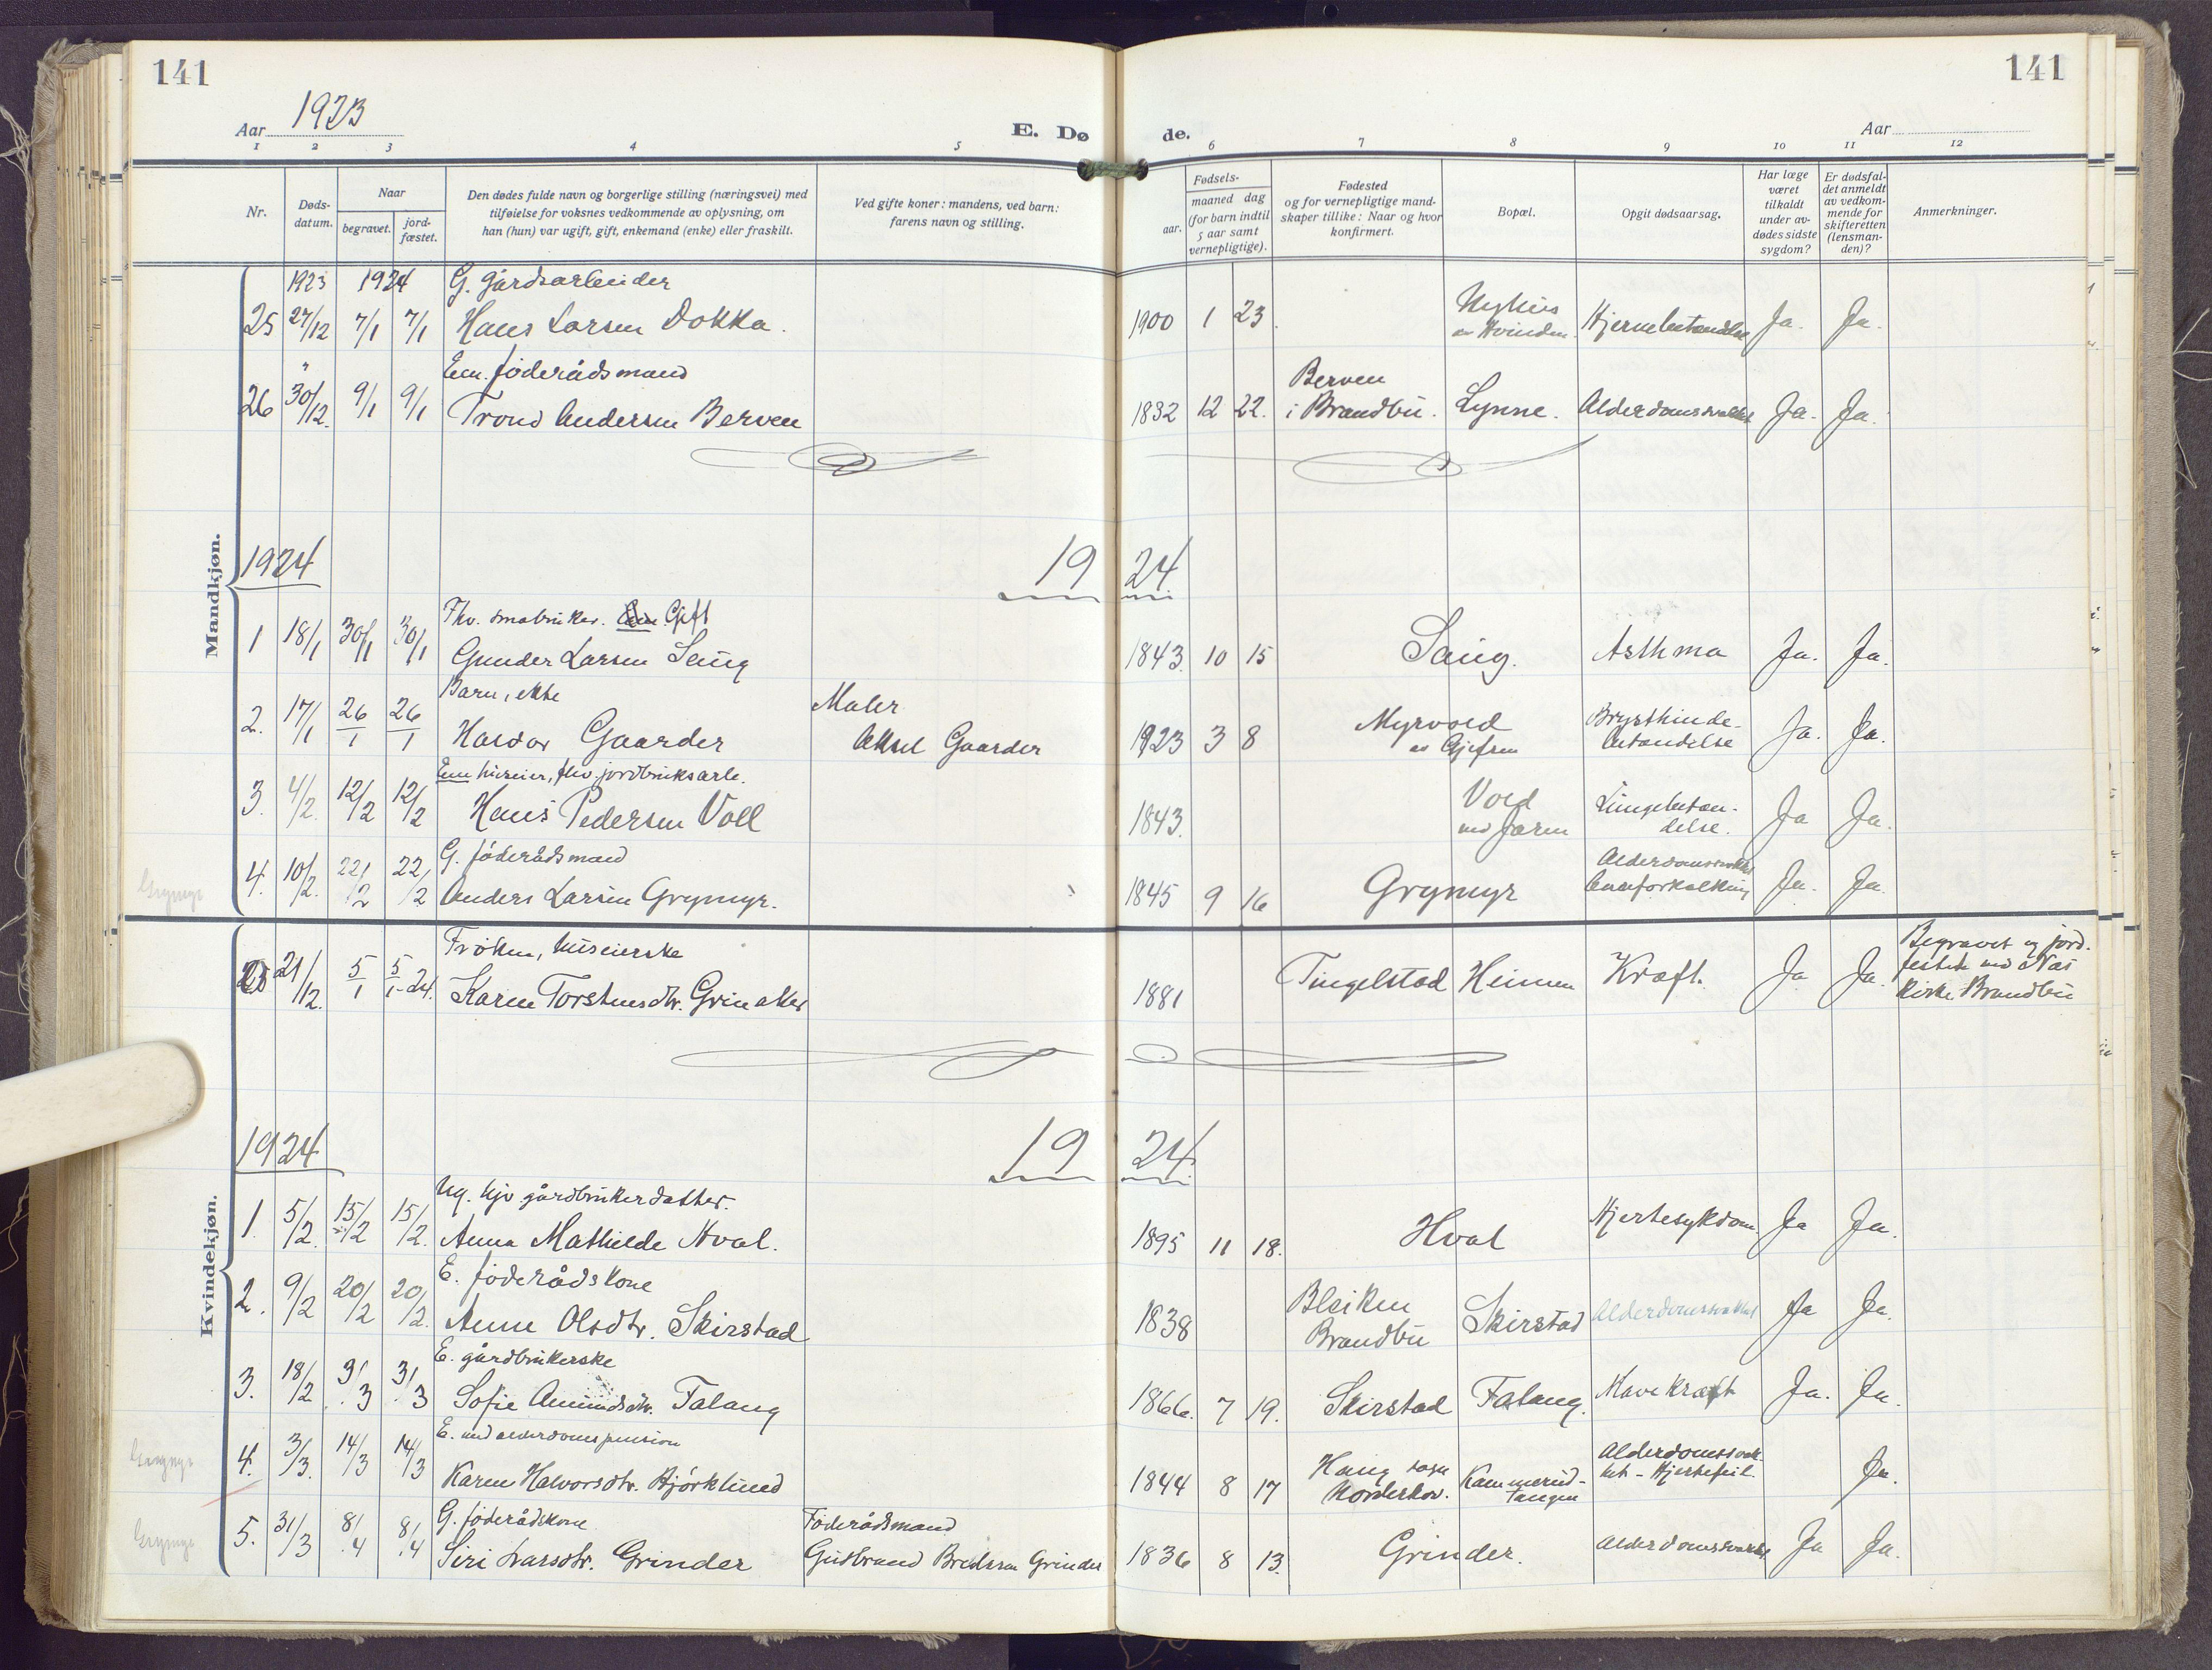 SAH, Gran prestekontor, Ministerialbok nr. 23, 1919-1938, s. 141